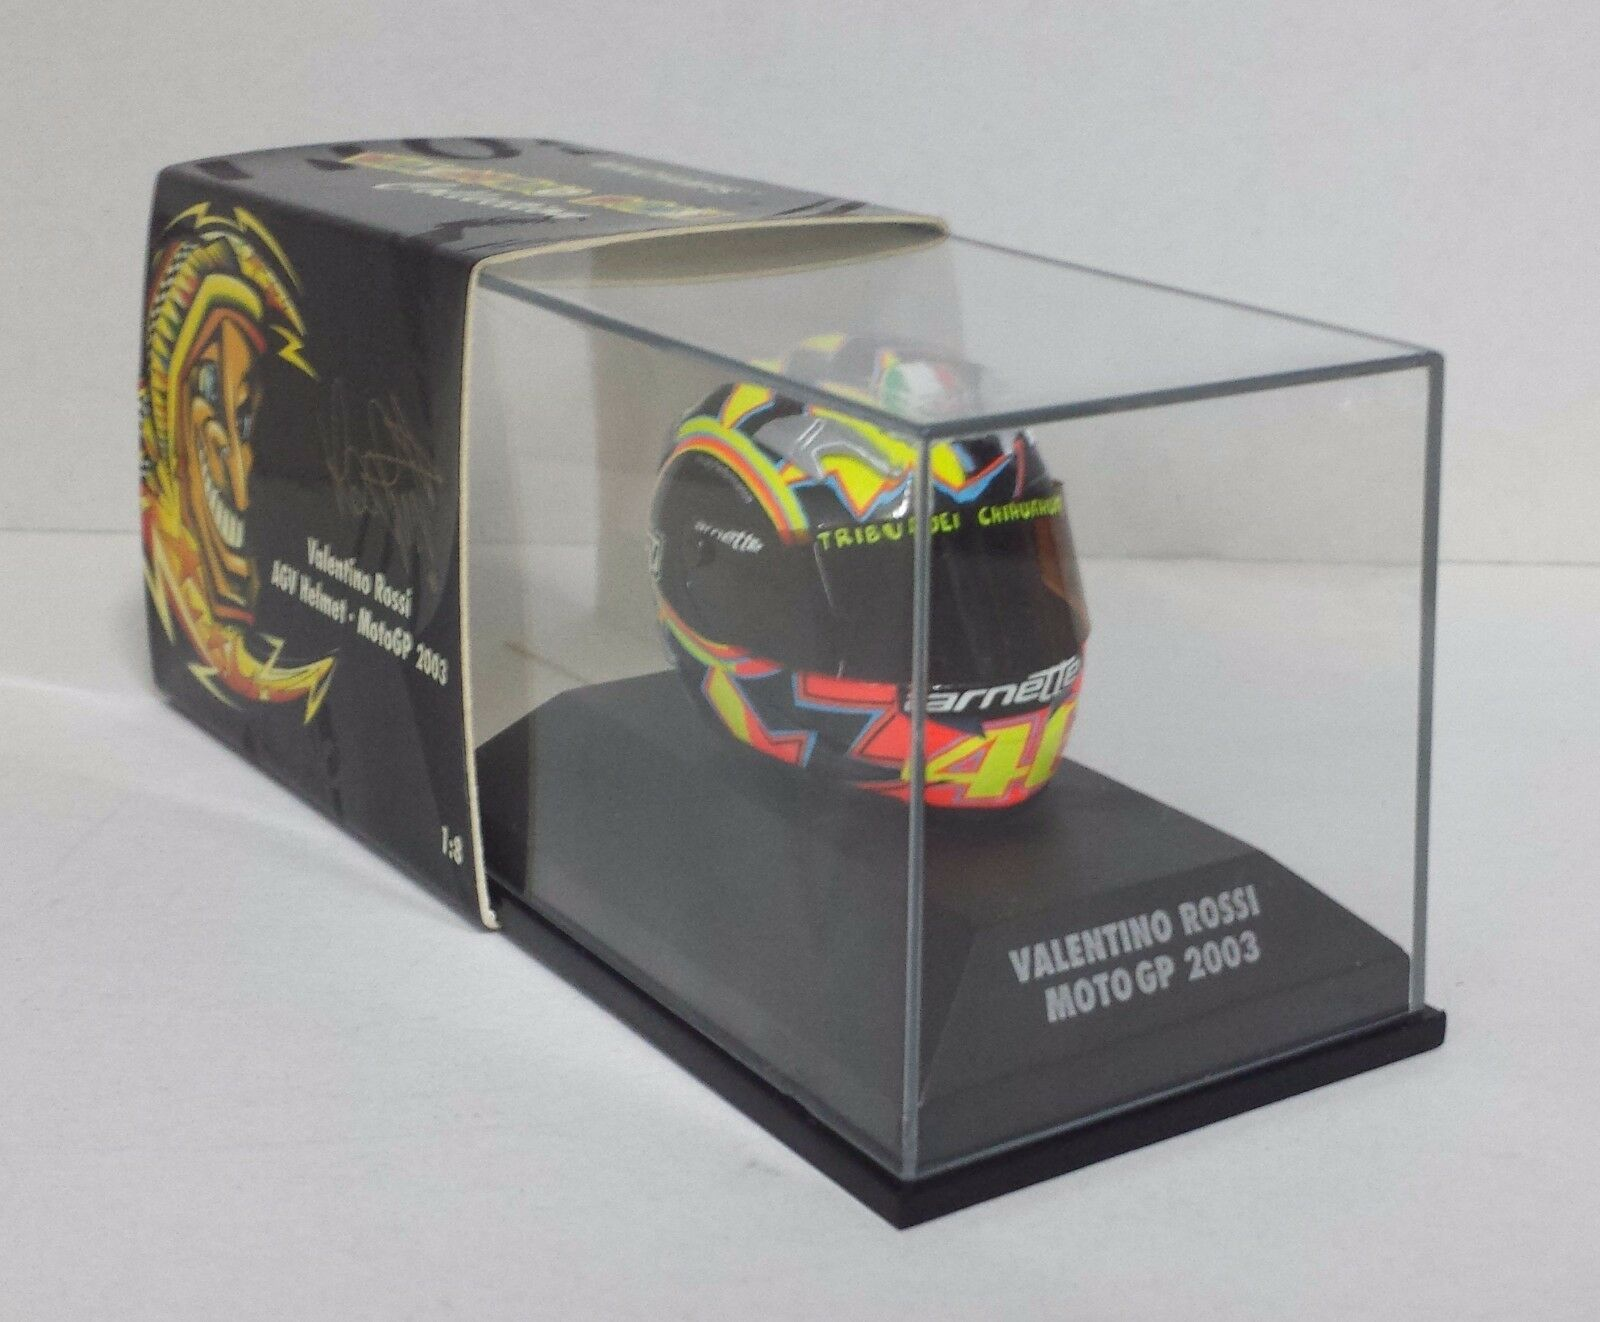 solo cómpralo Minichamps Minichamps Minichamps Valentino Rossi AGV Casco Helmet 1 8 World Champion Motogp 2003 Raro  Obtén lo ultimo